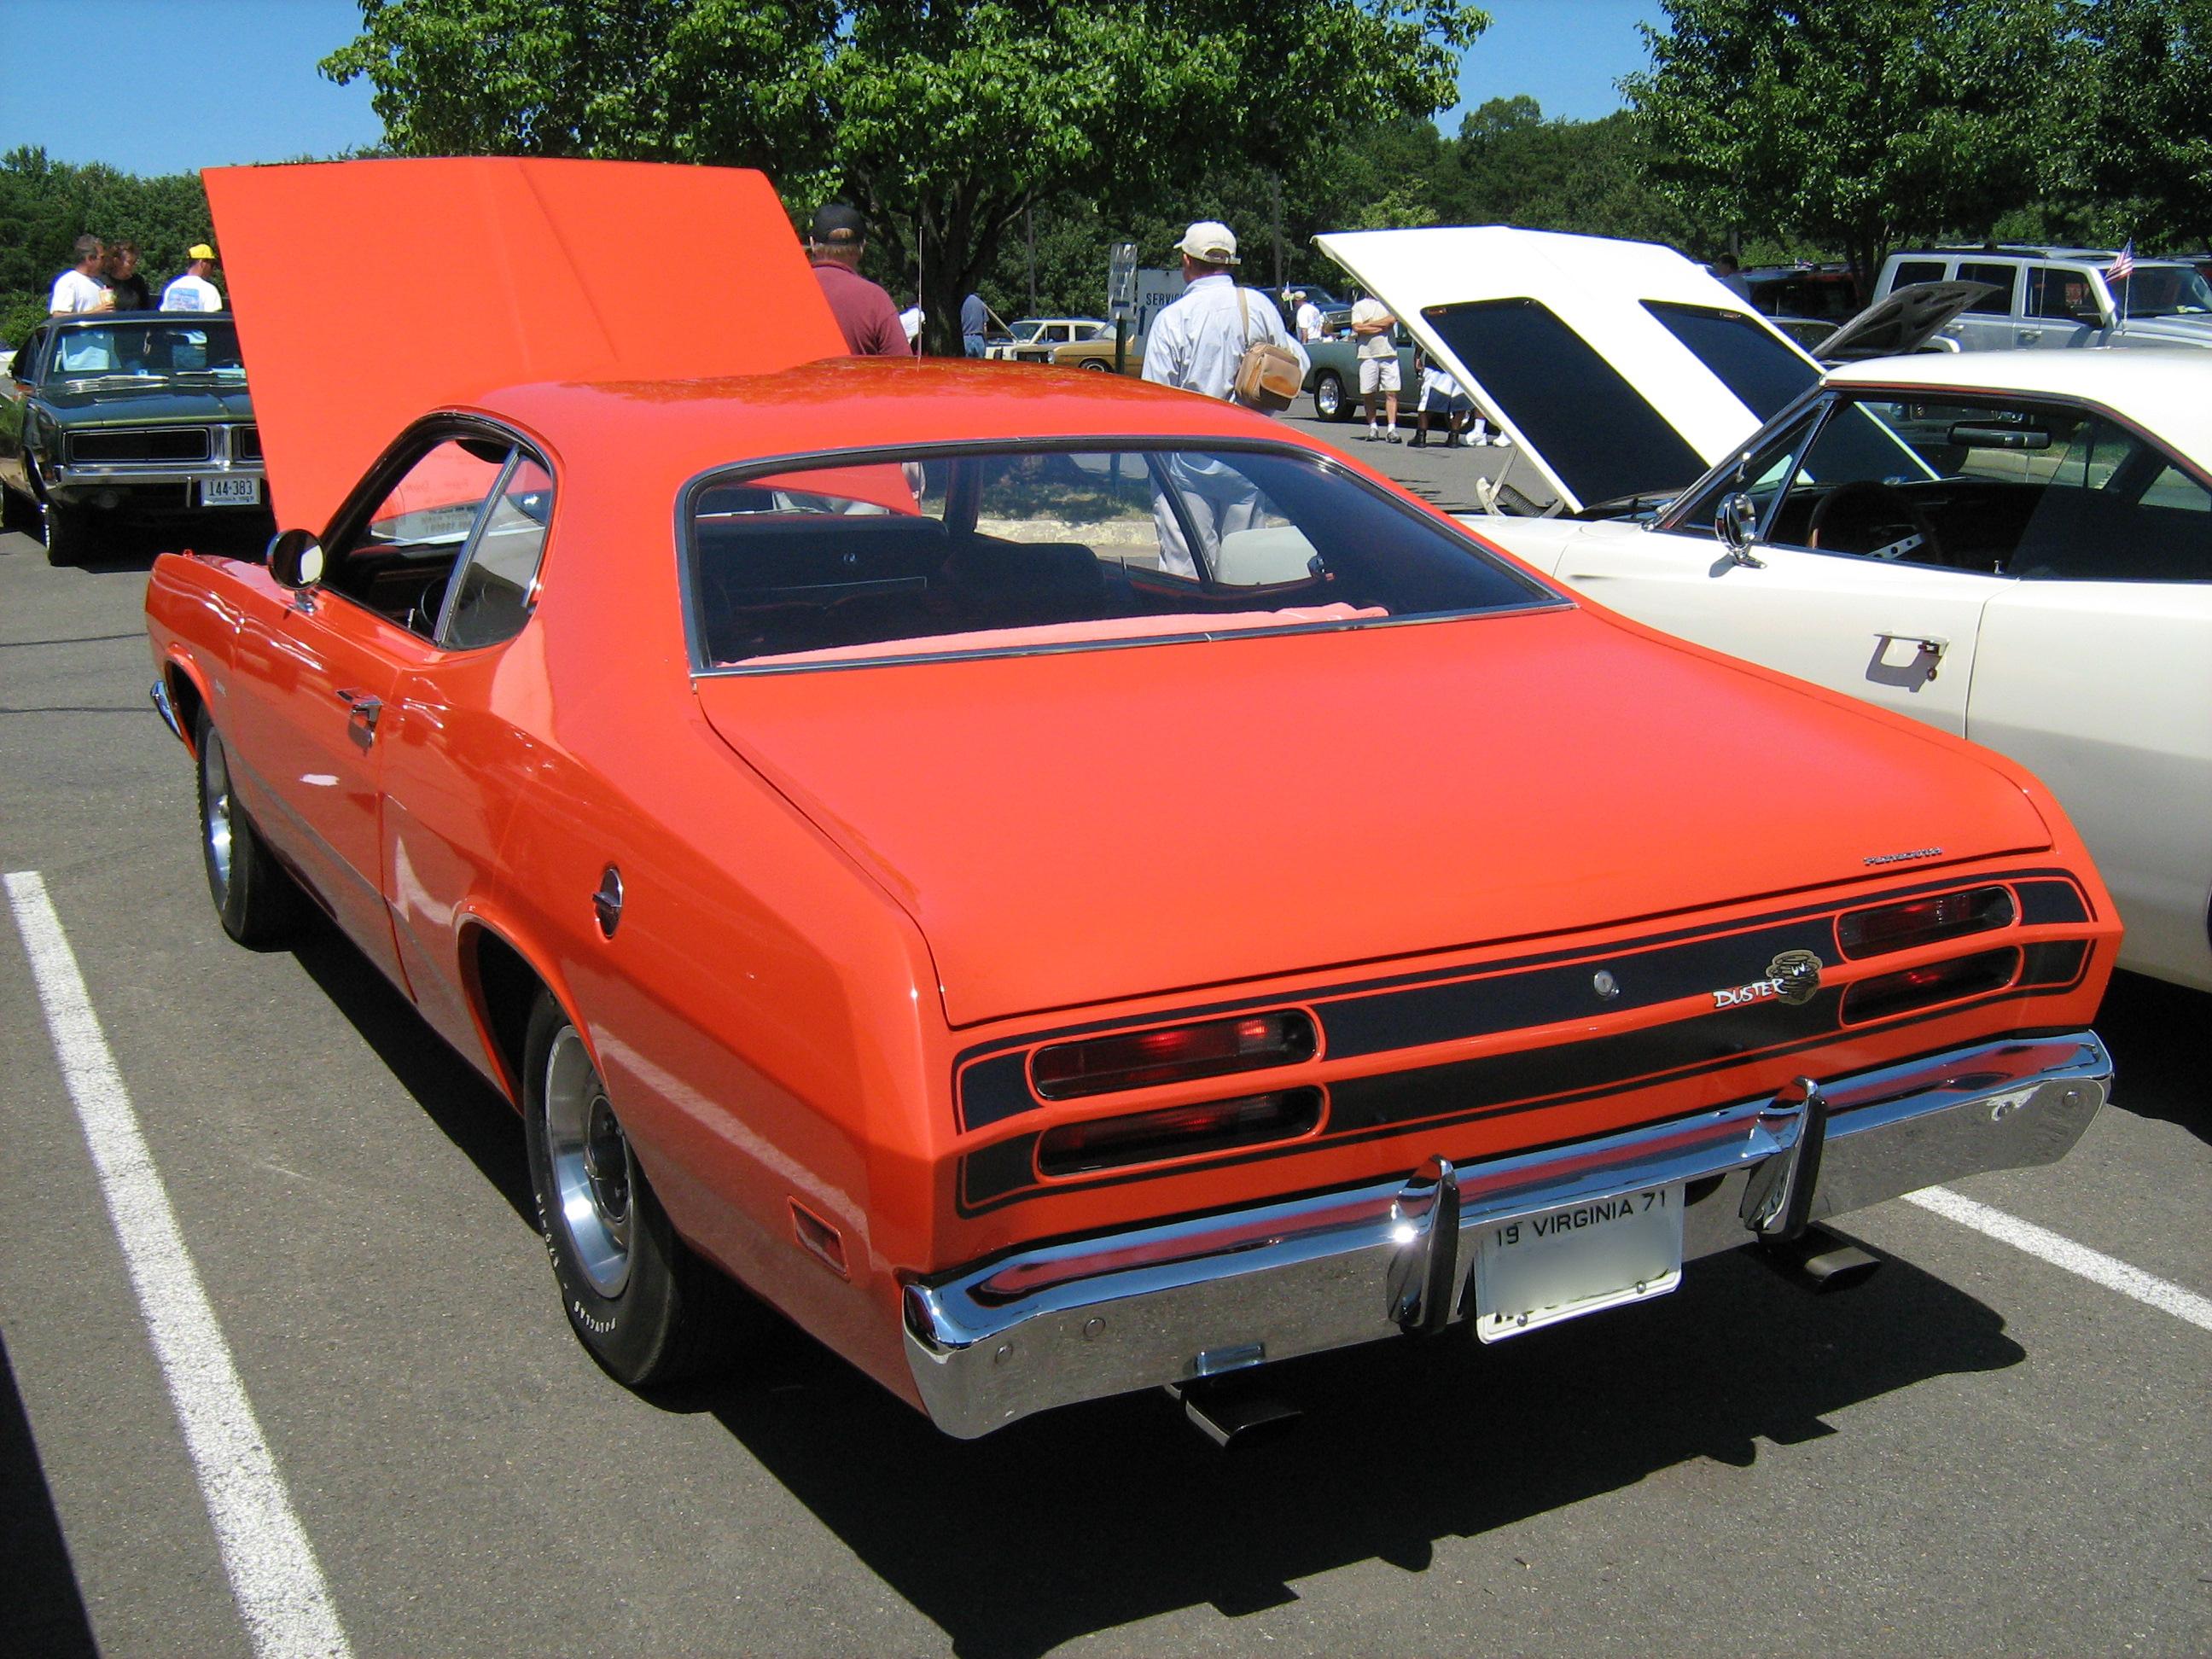 Dodge Demon Dashboard >> File:1971 Plymouth Duster Orange va-r.jpg - Wikimedia Commons